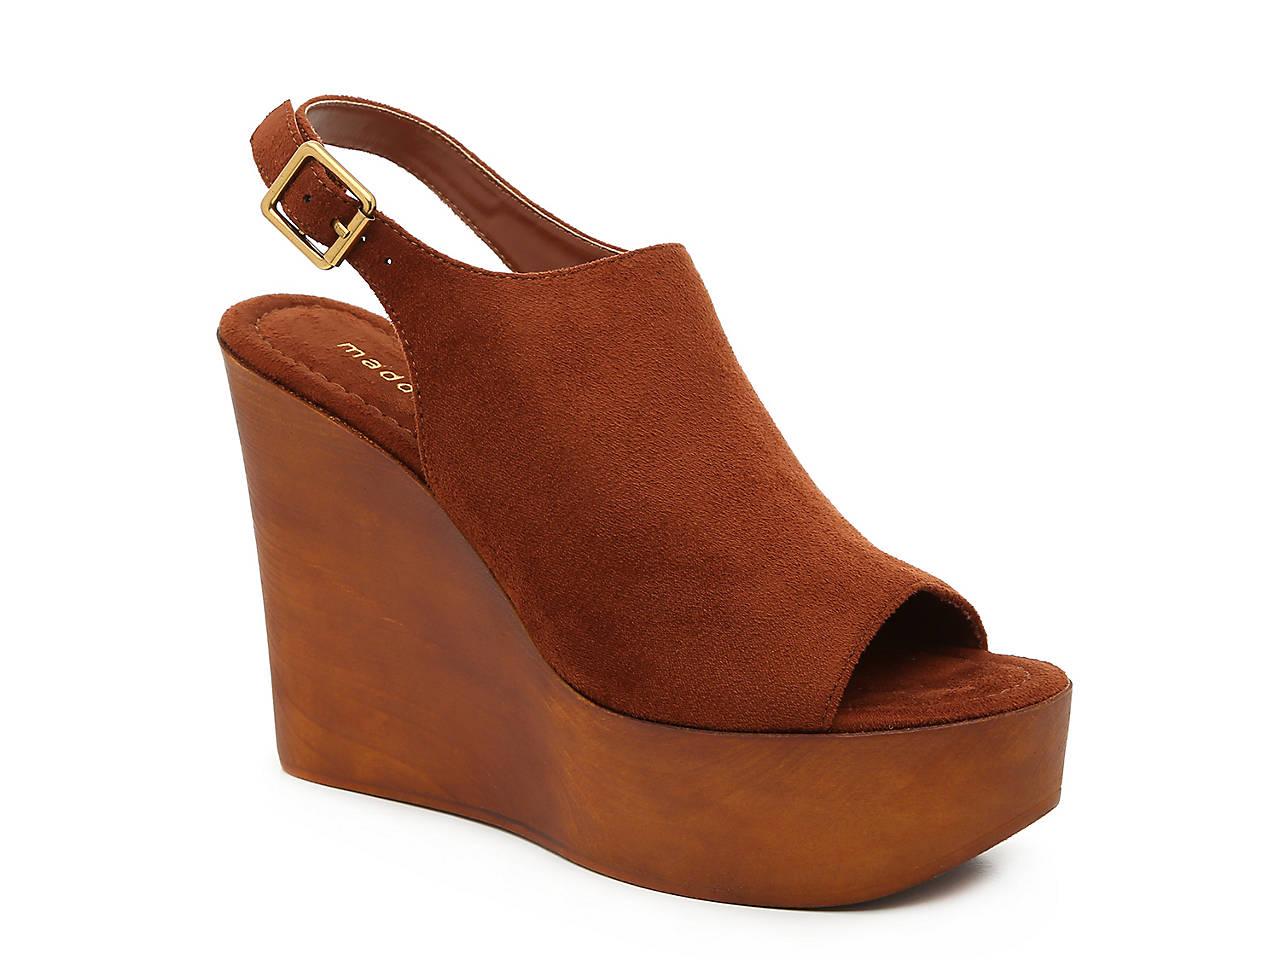 751bfd073fde Madden Girl Cambur Wedge Sandal Women's Shoes | DSW